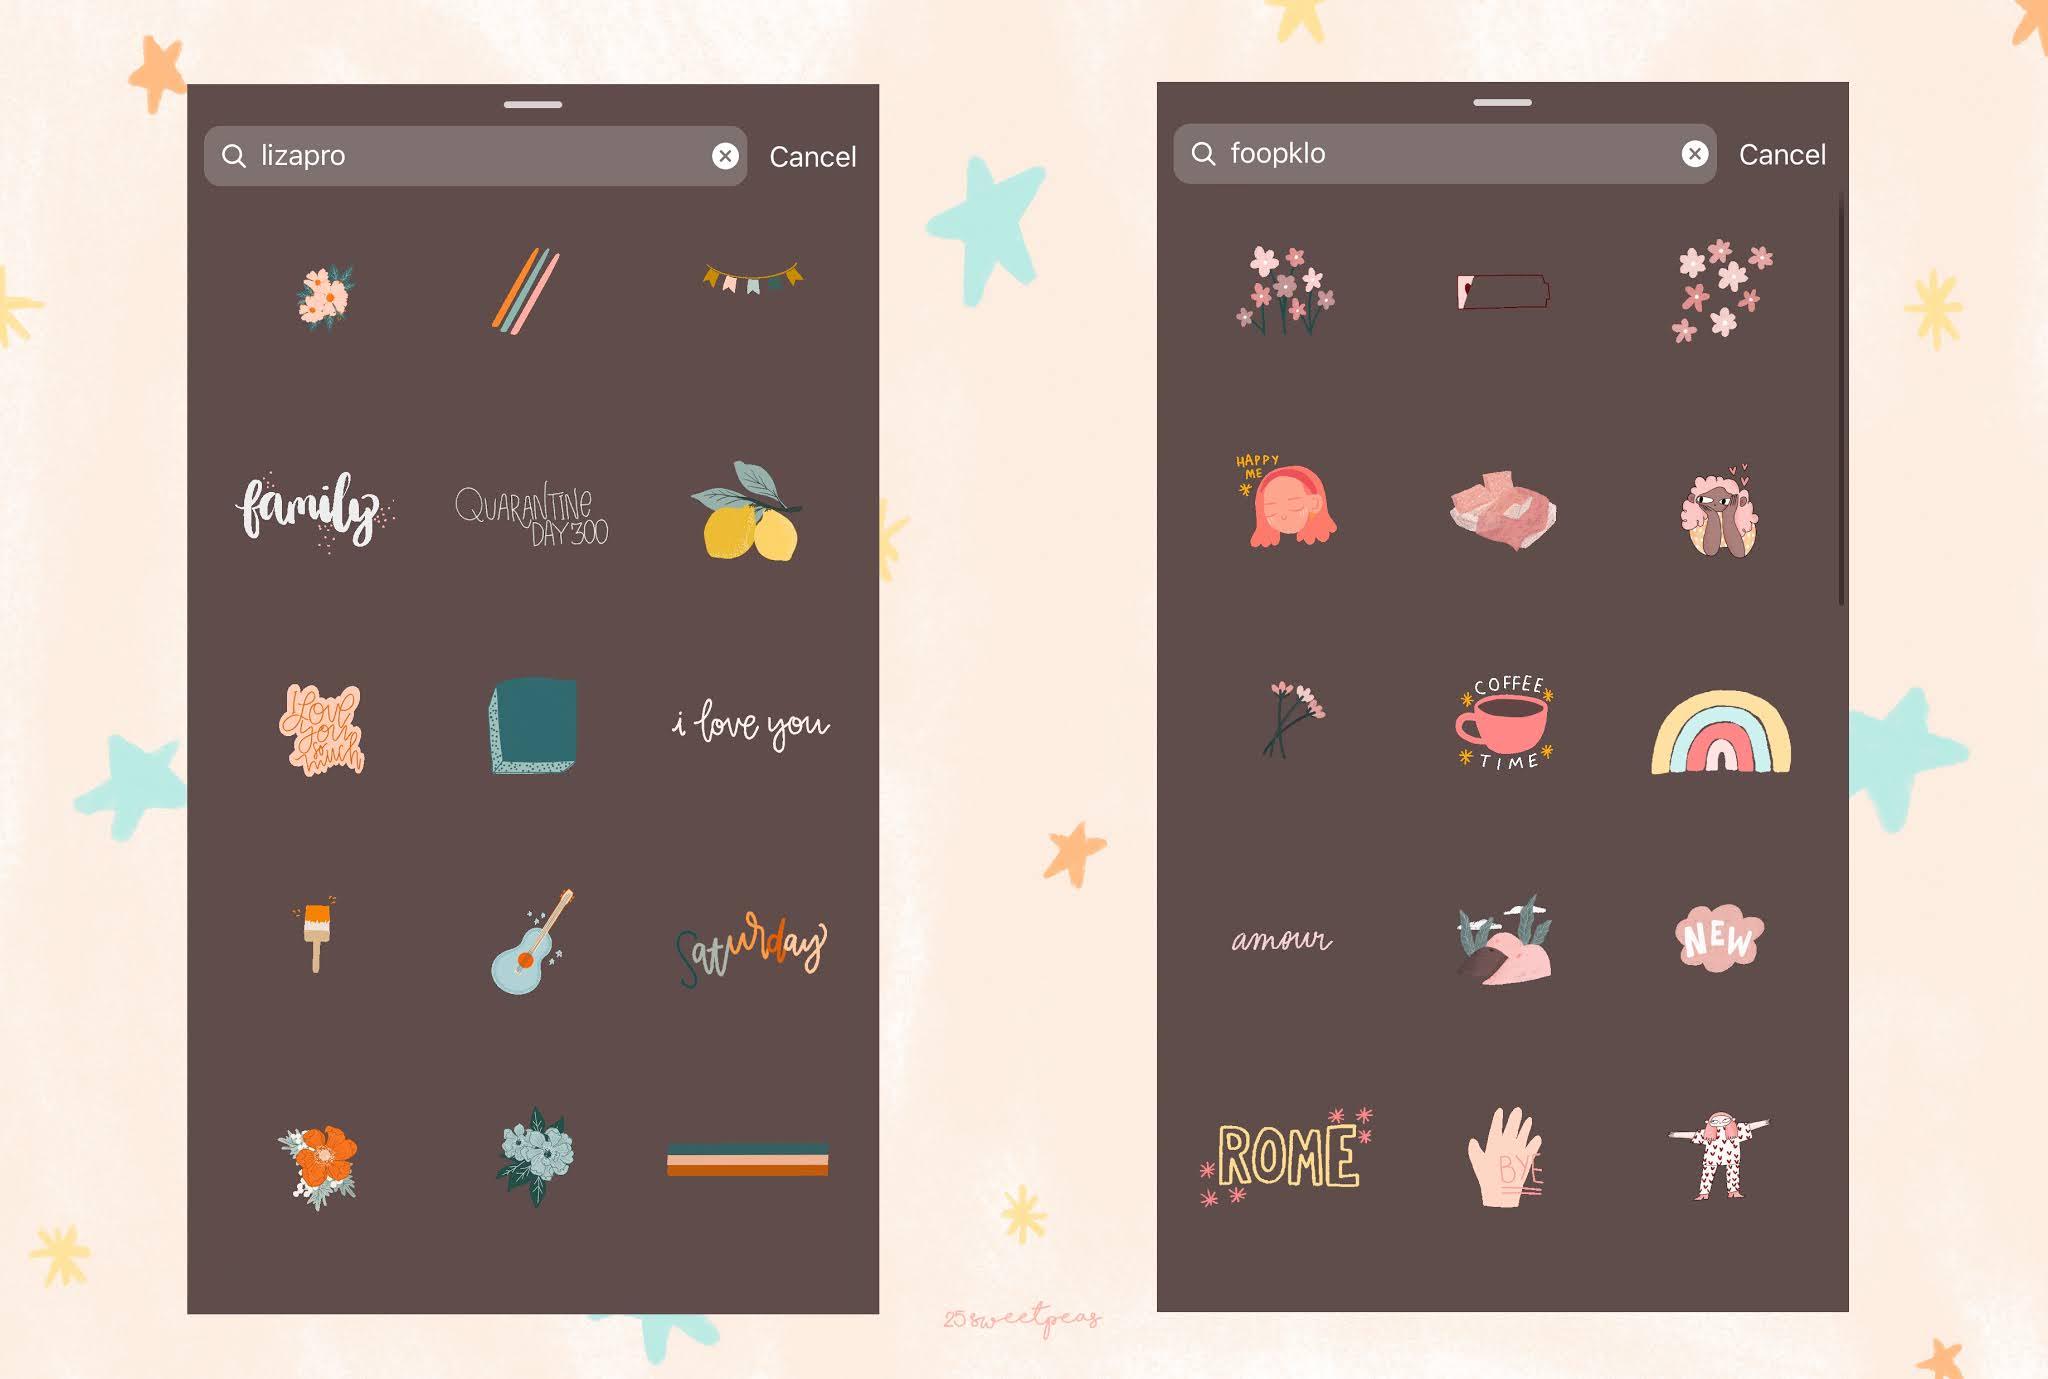 Cute Gifs For Instagram Stories 25 Sweetpeas